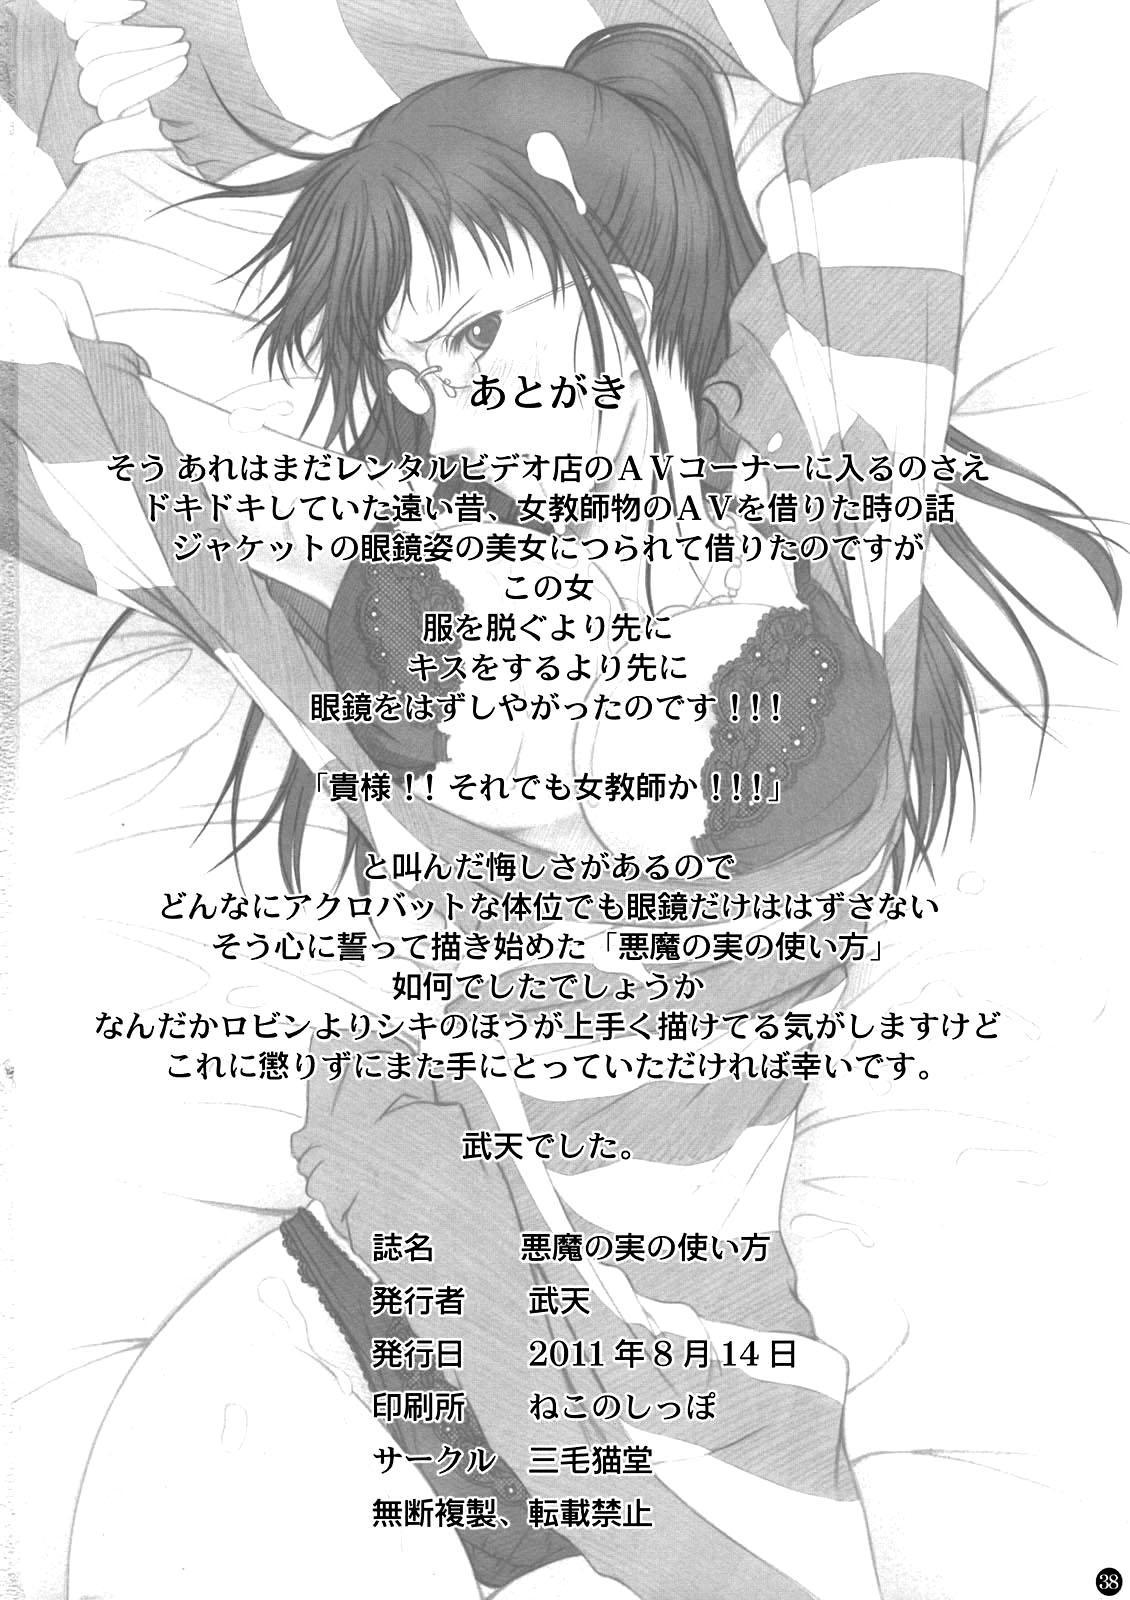 Akuma no Mi no Tsukaikata | The Use of Devil Fruits 37